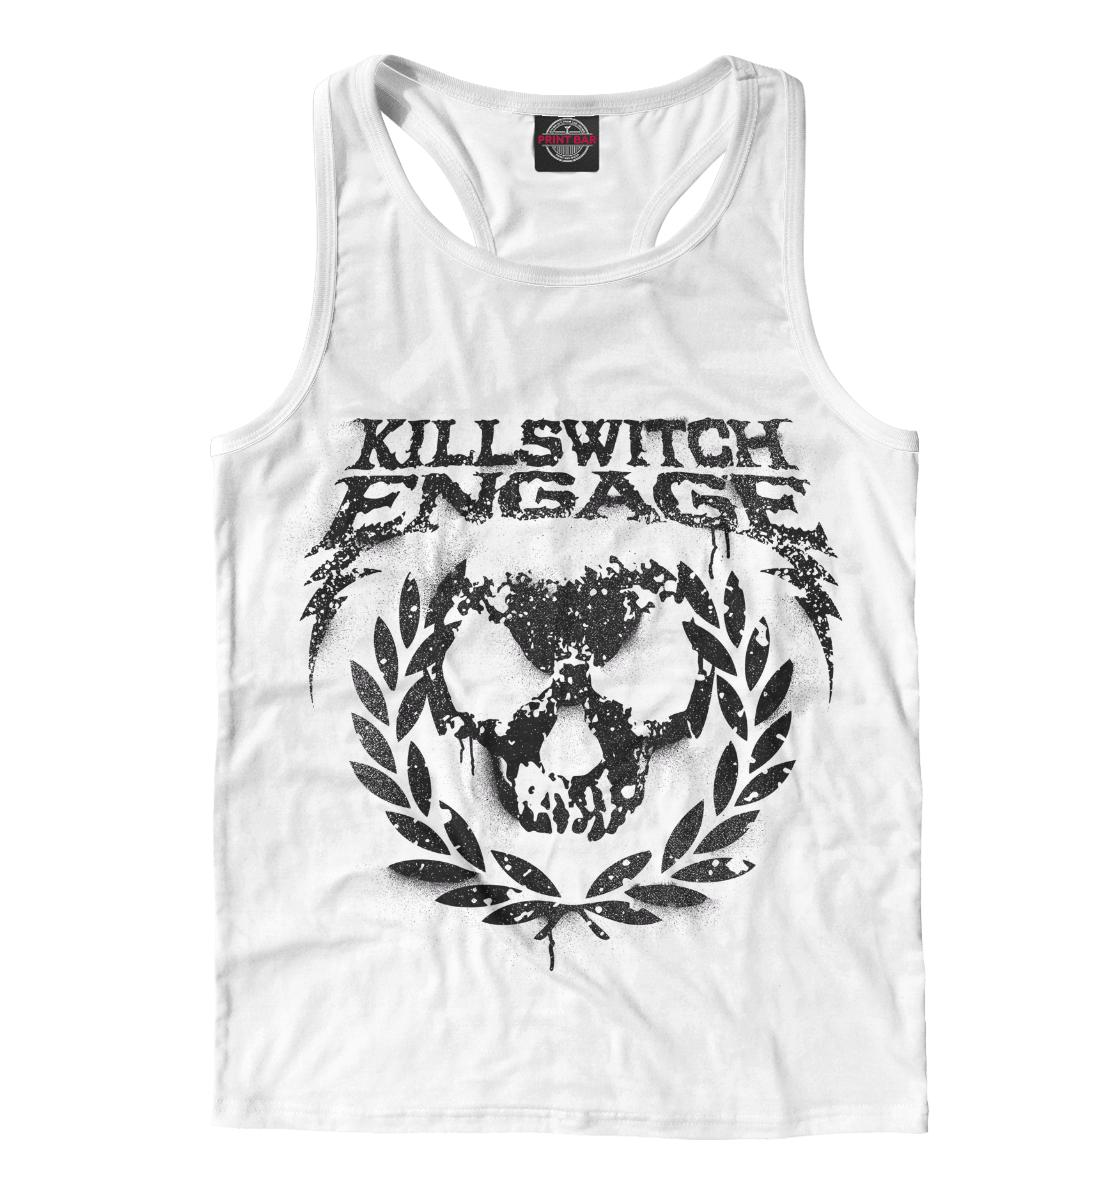 Купить Killswitch Engage, Printbar, Майки борцовки, KSE-339241-mayb-2